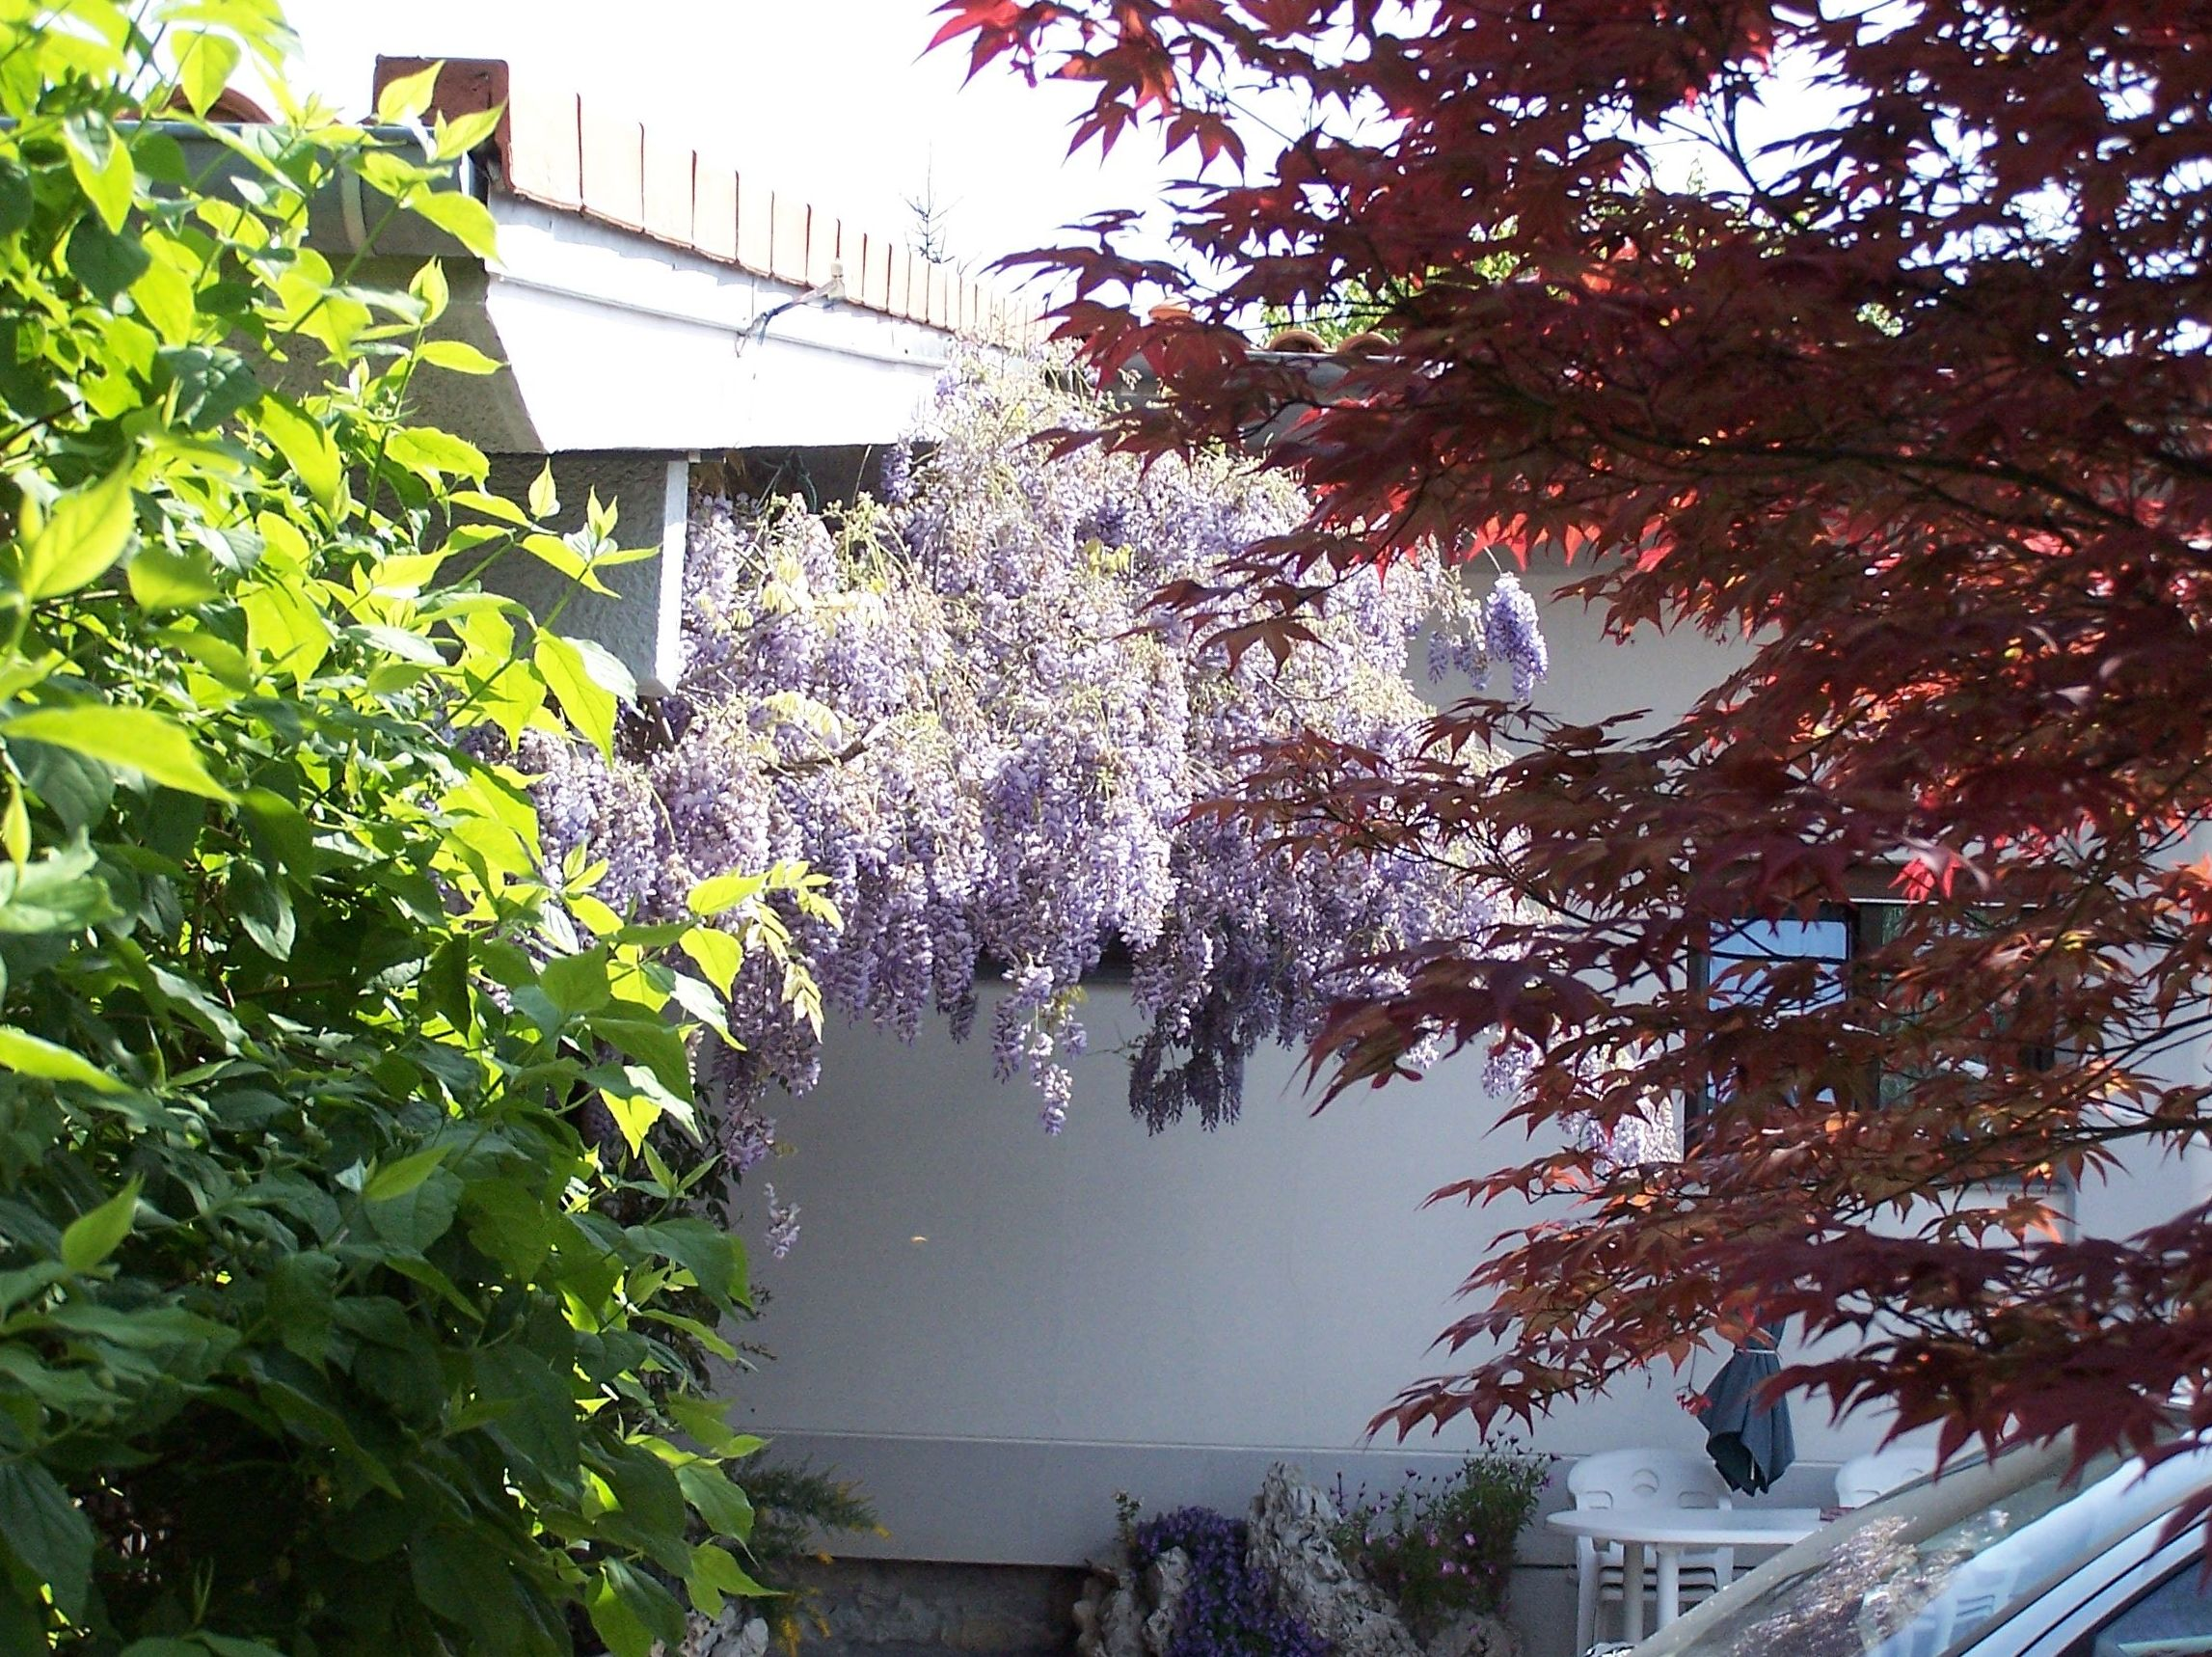 Mantenimiento de jardines en Urdúliz, Bizkaia